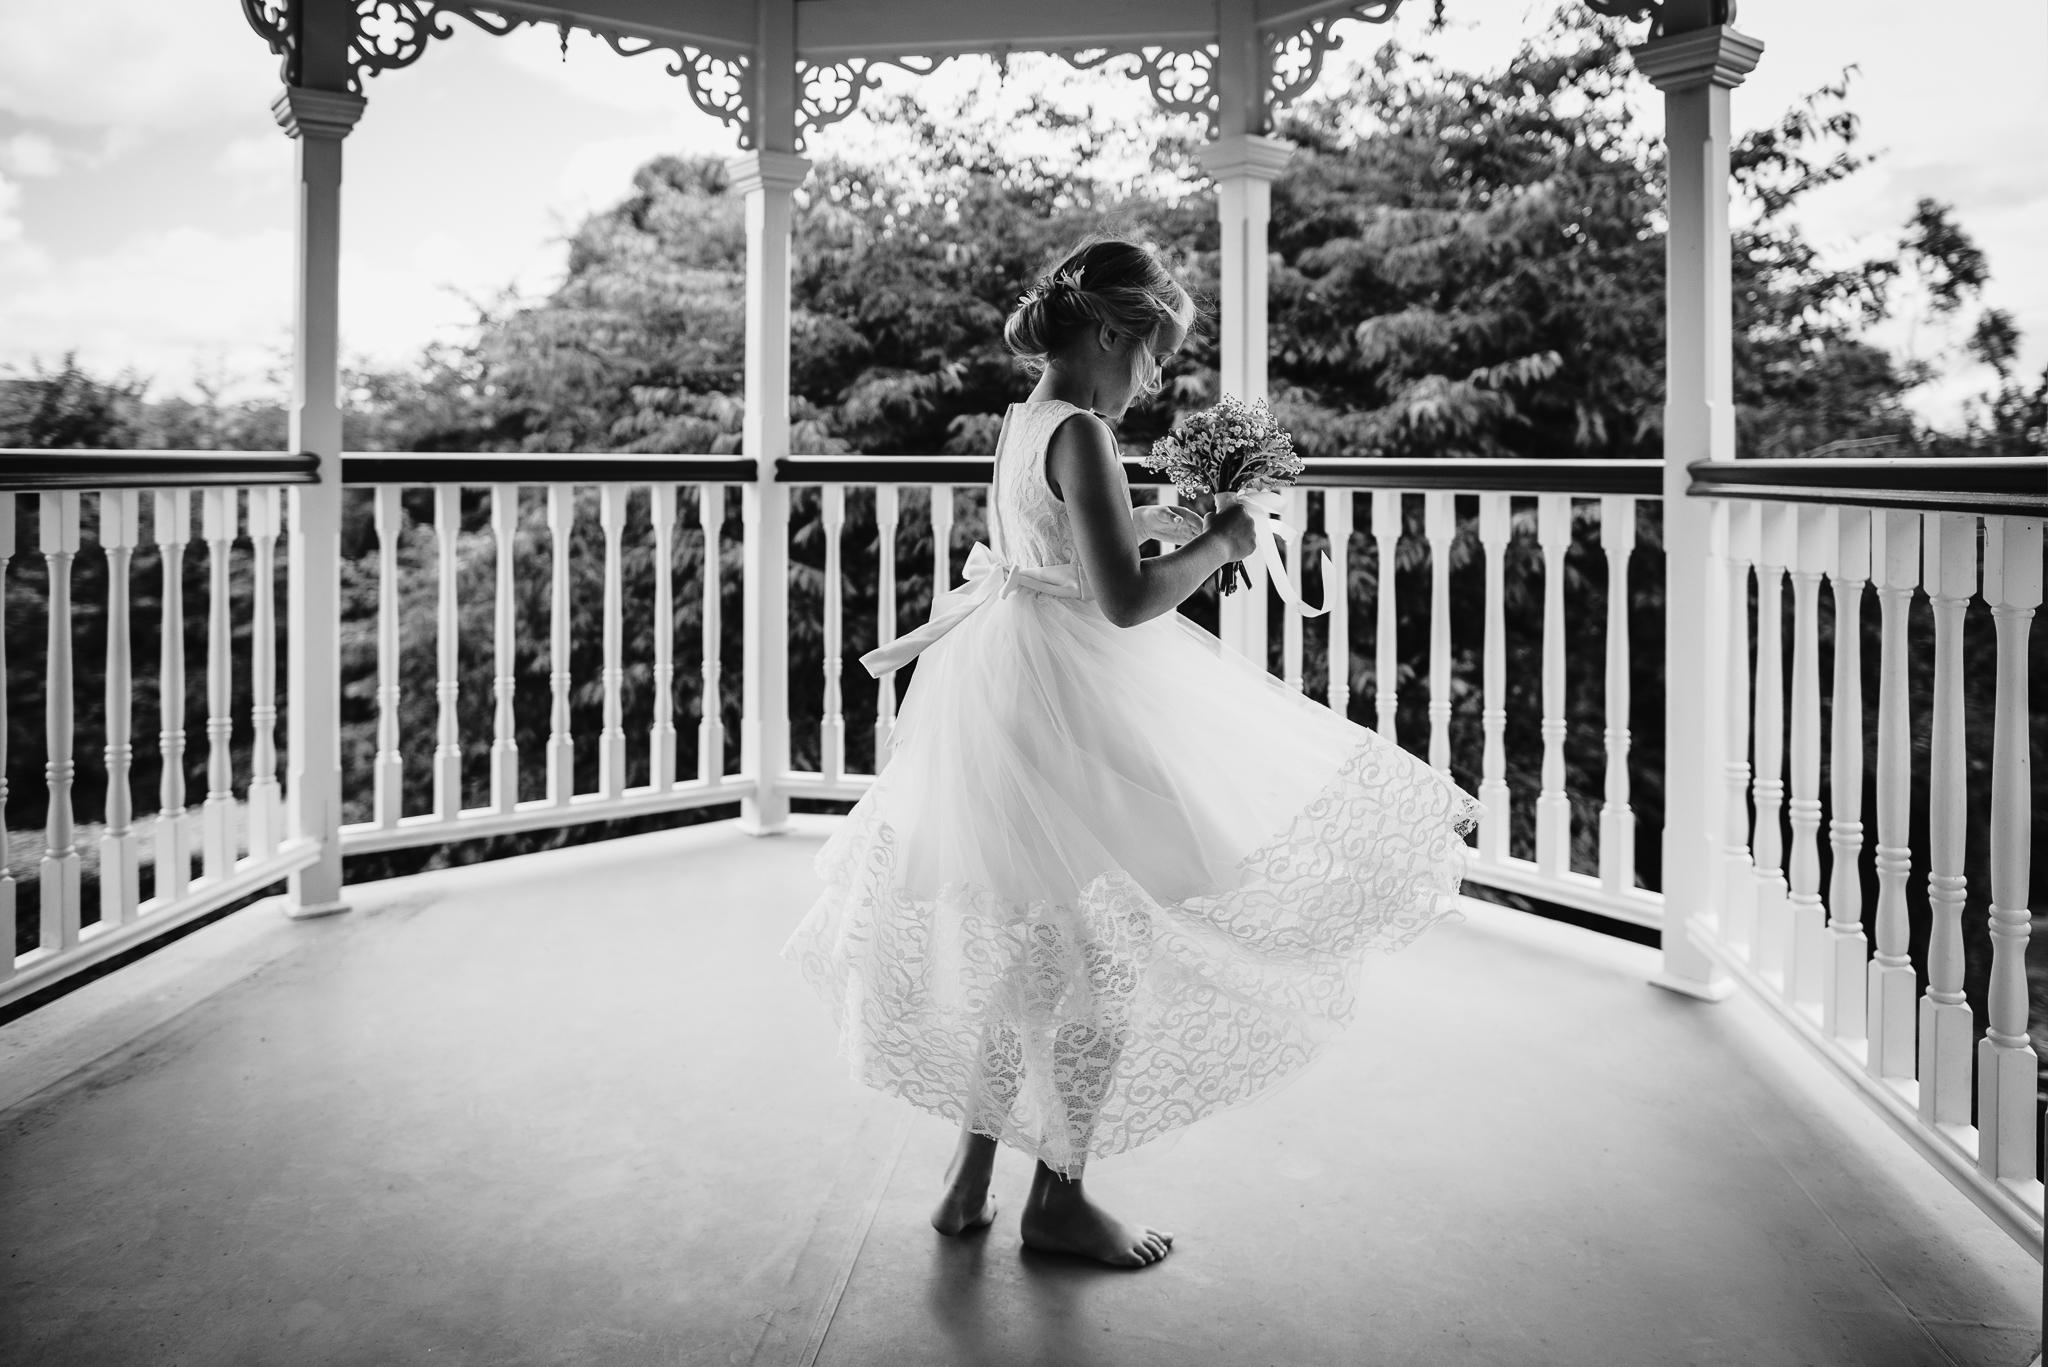 Tauranga-Coromandel-Elegant-Wedding-Photographer-Charlemagne-Lodge-28.jpg